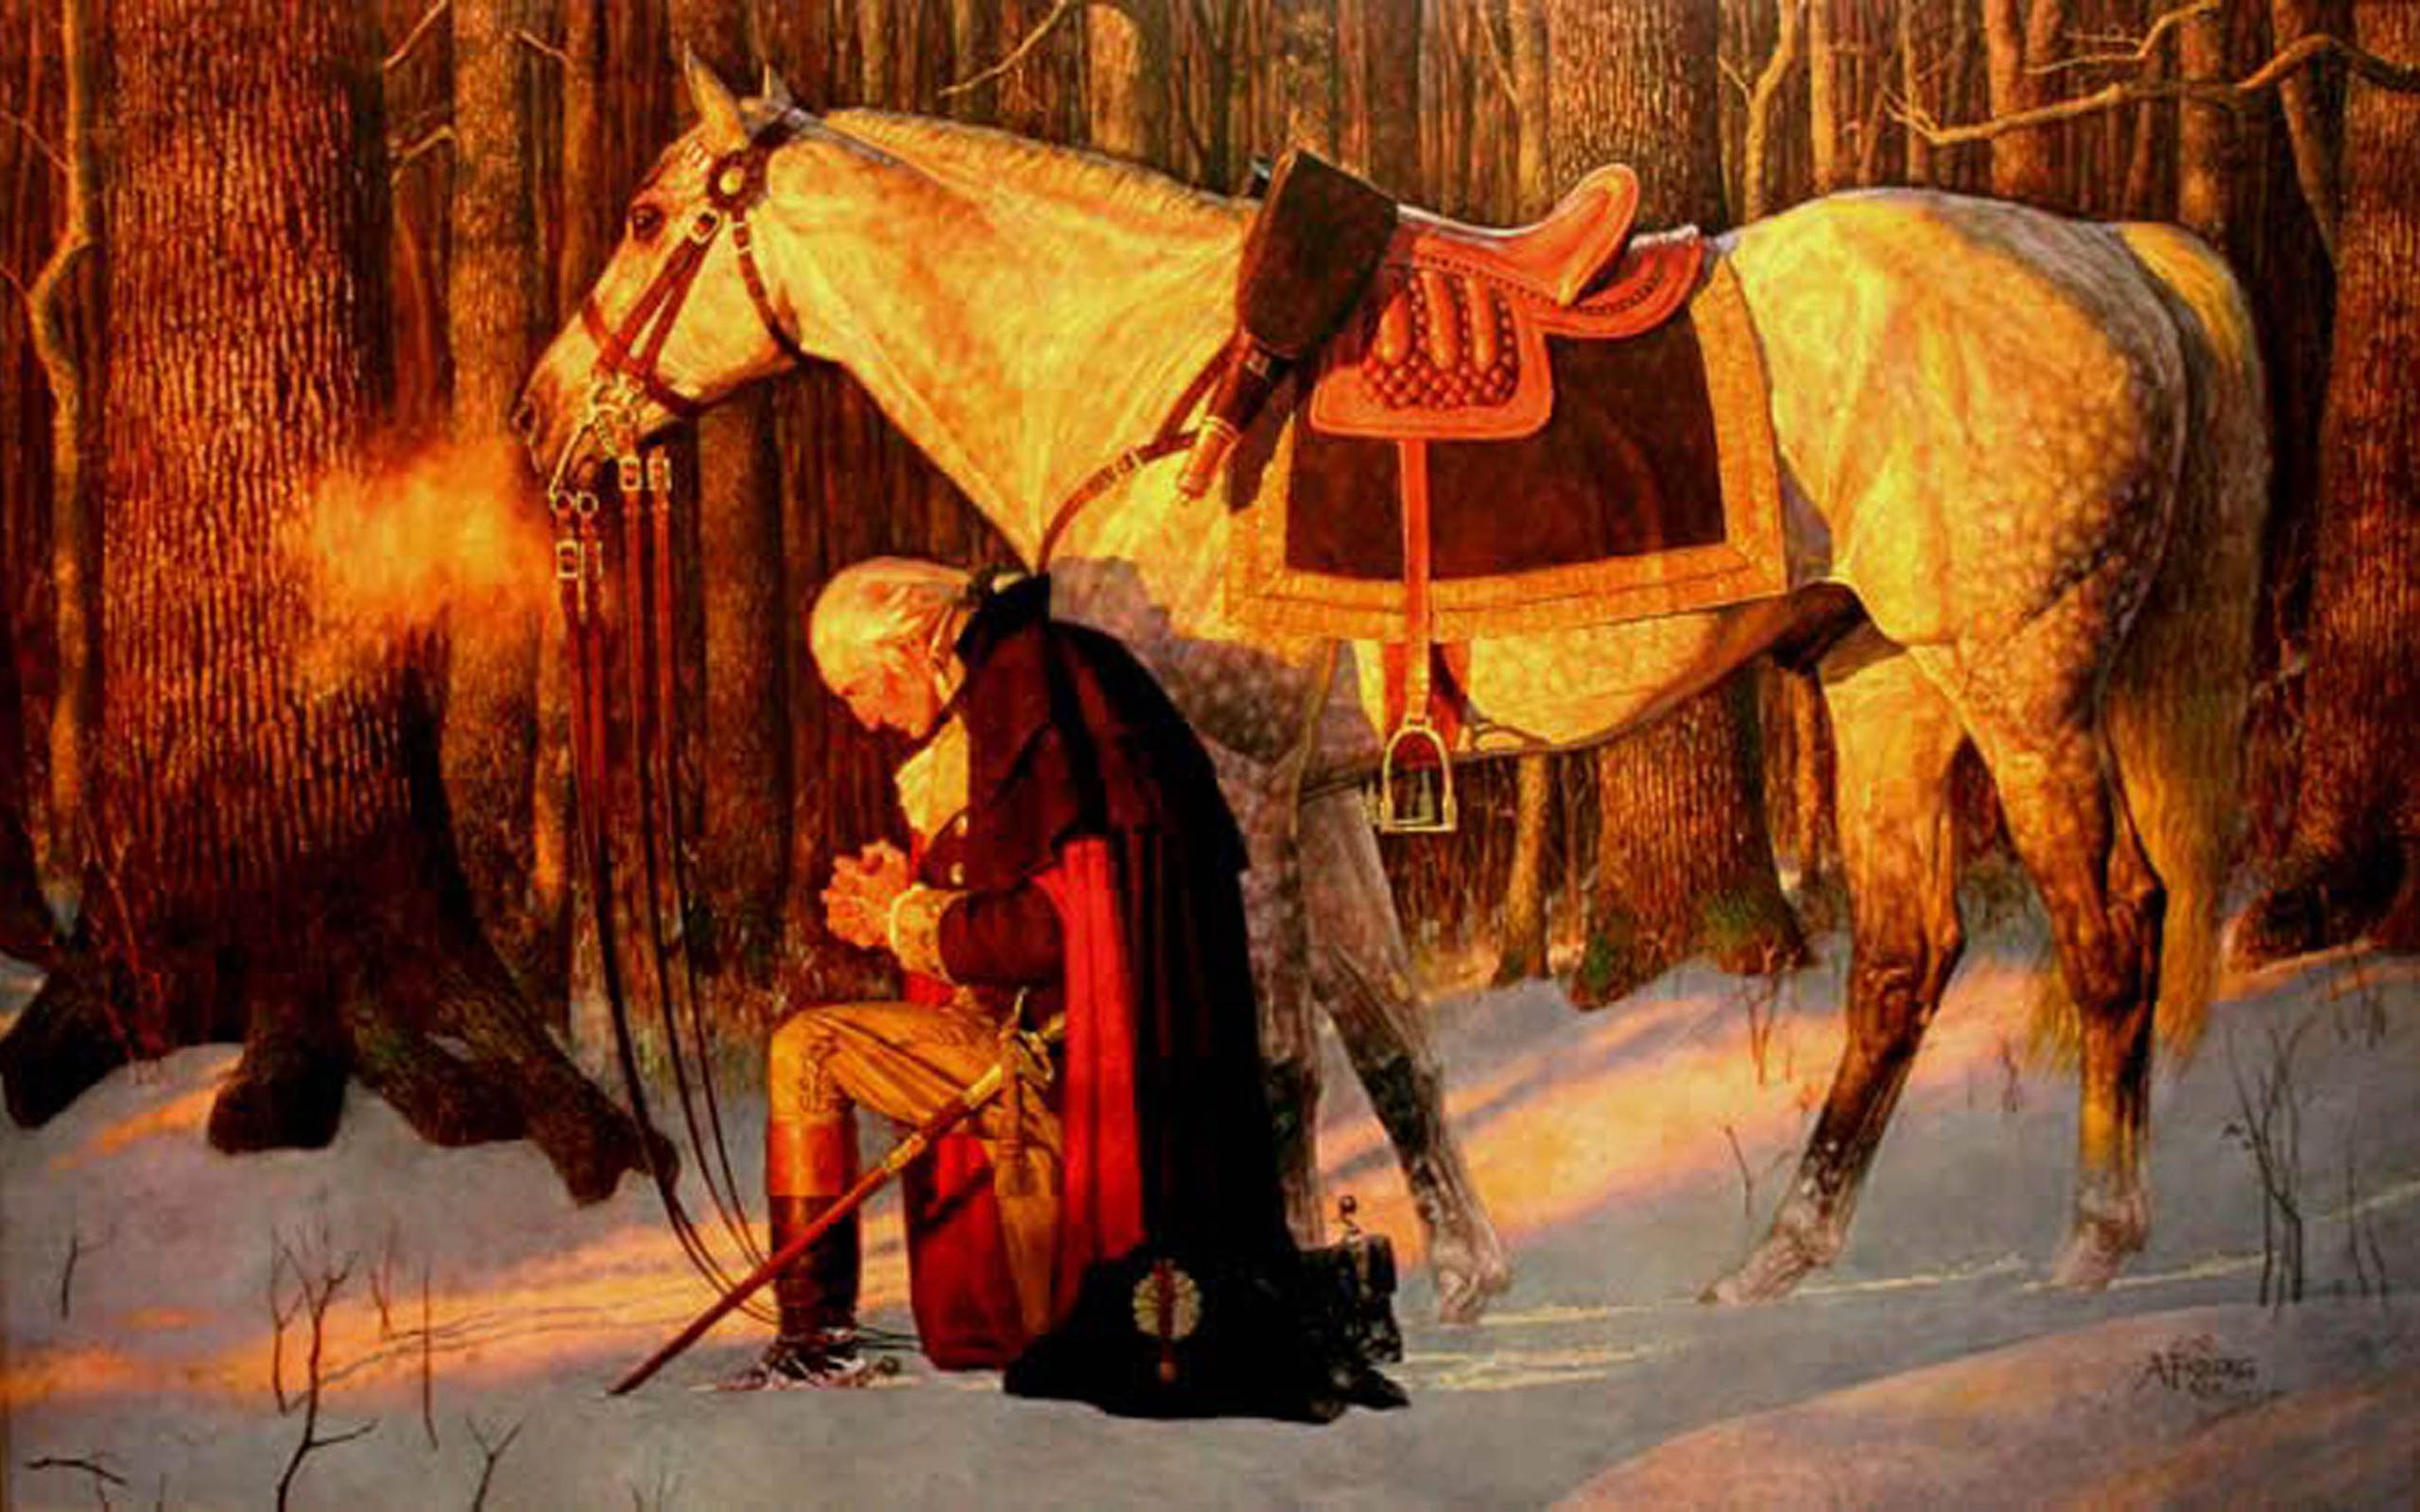 2560x1600 George Washington George Washington Praying 2560x1600